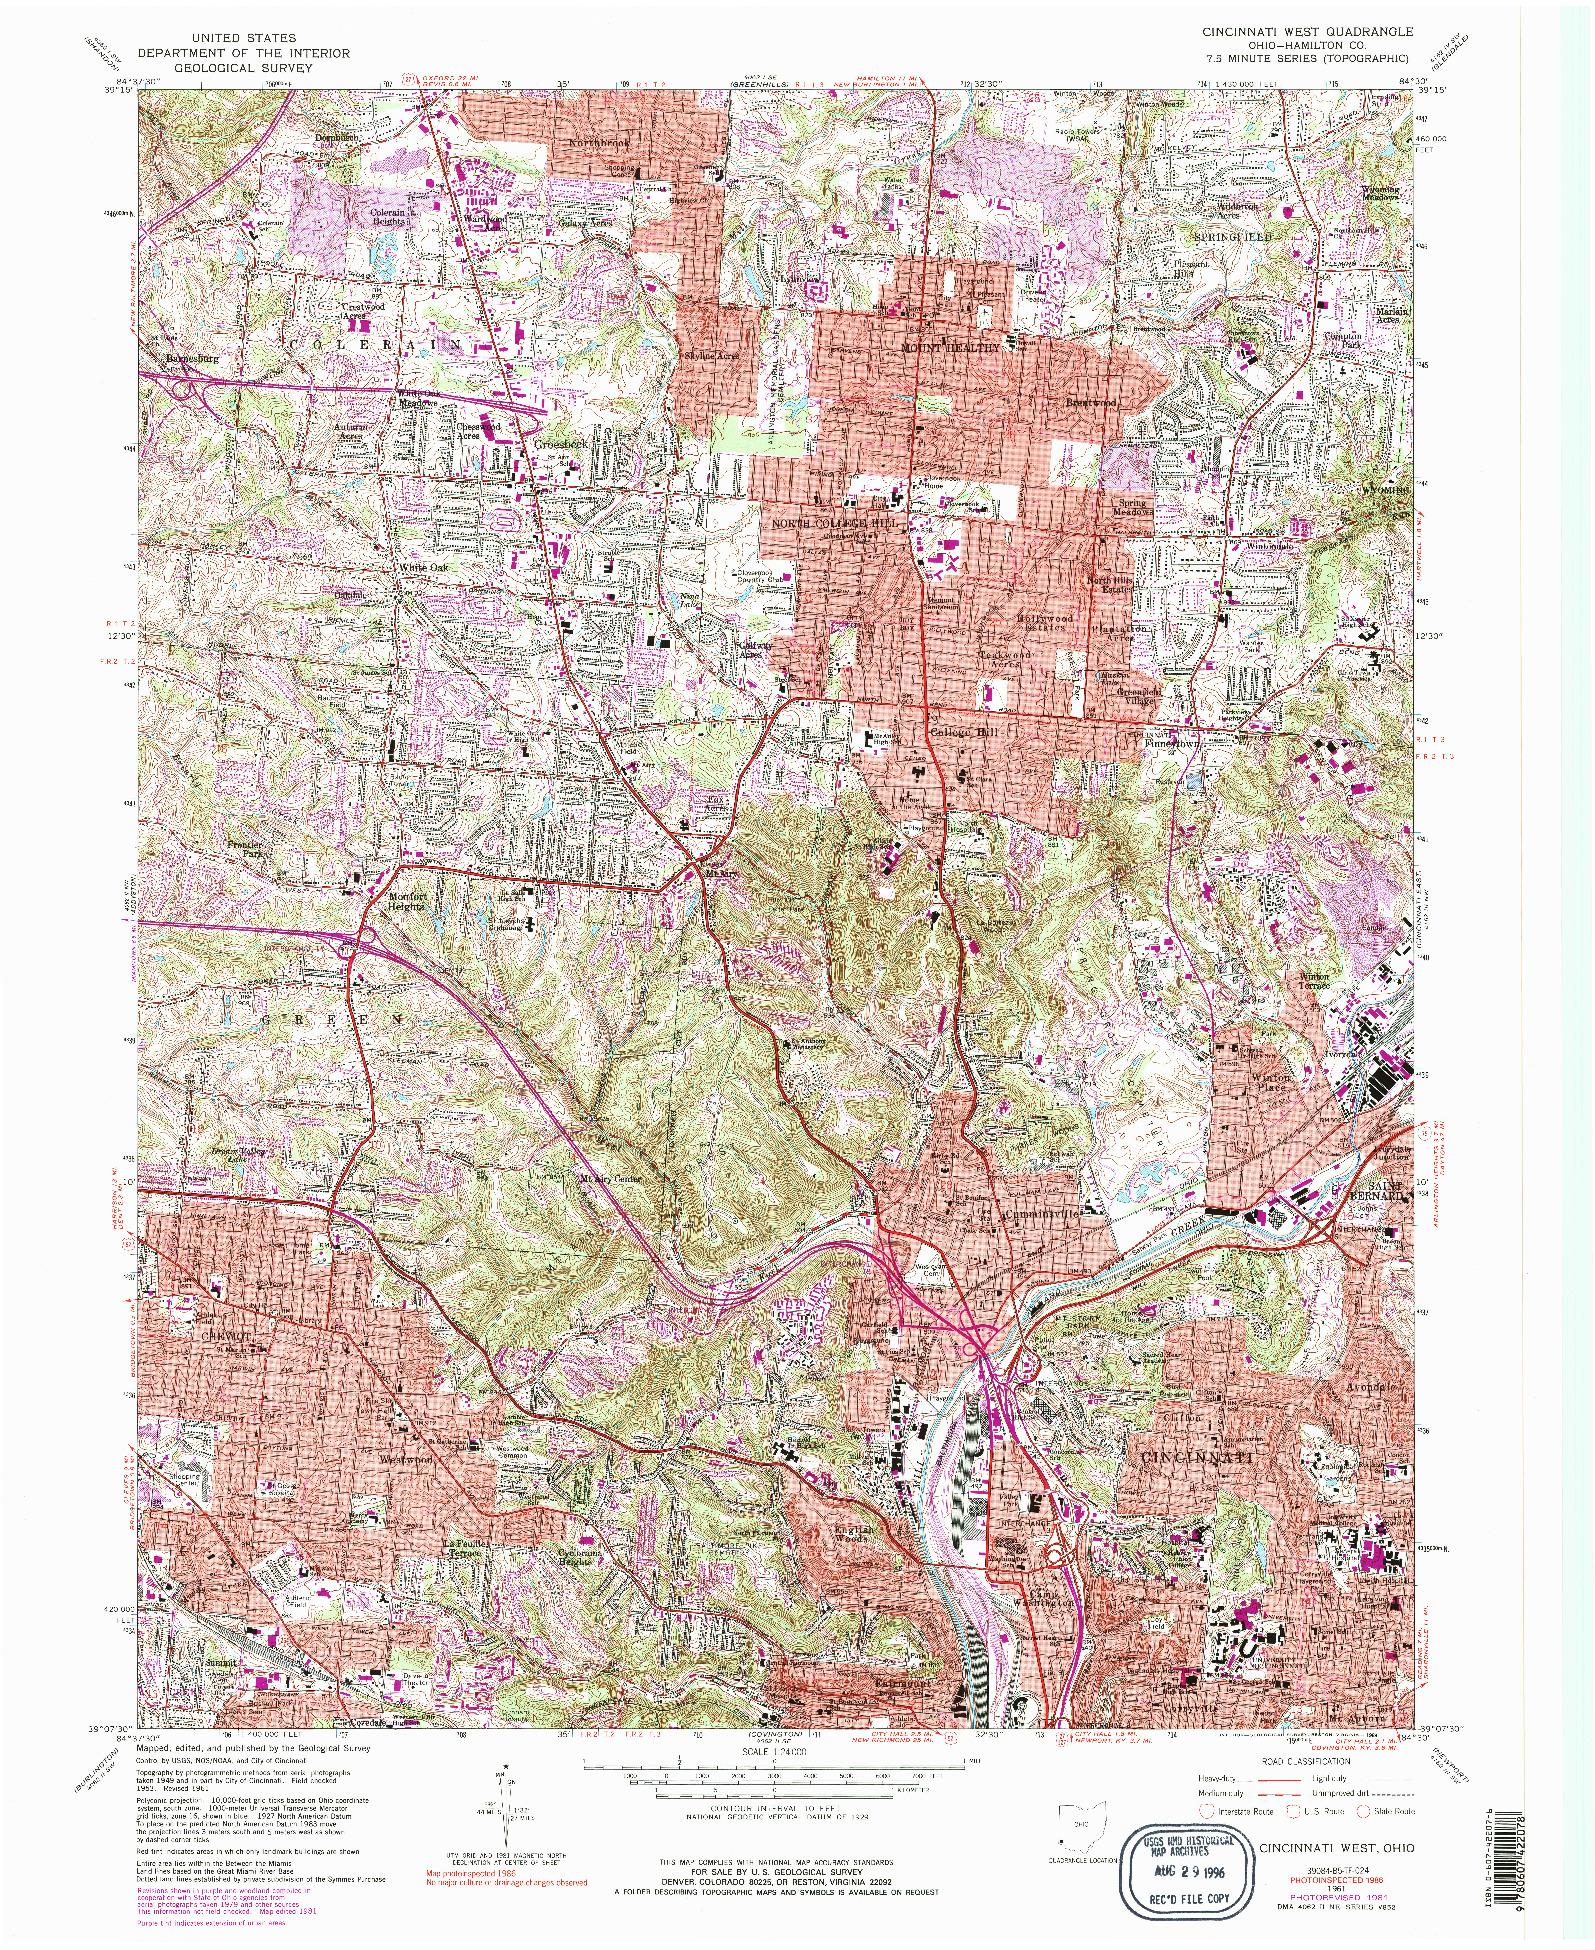 USGS 1:24000-SCALE QUADRANGLE FOR CINCINNATI WEST, OH 1961